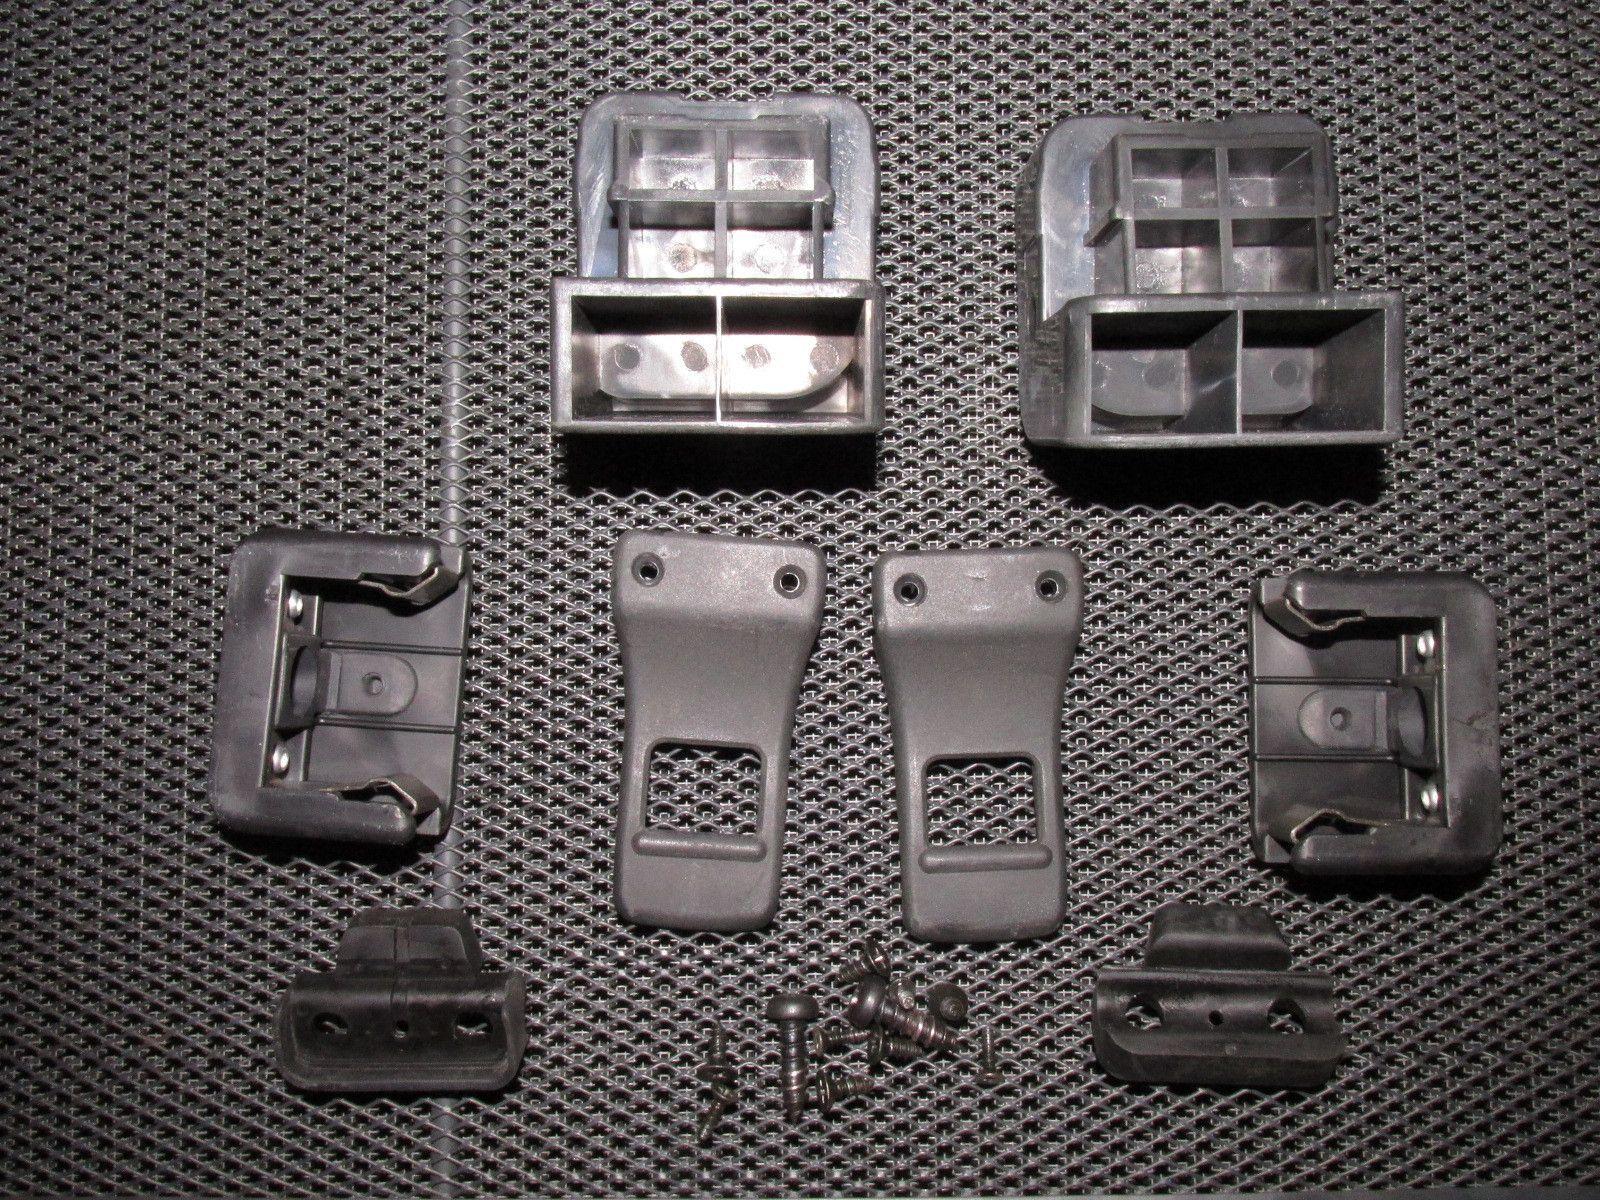 90 91 92 93 94 95 96 Nissan 300zx Oem Hatch Trunk Cover Holder 1991 Fuse Box Bracket